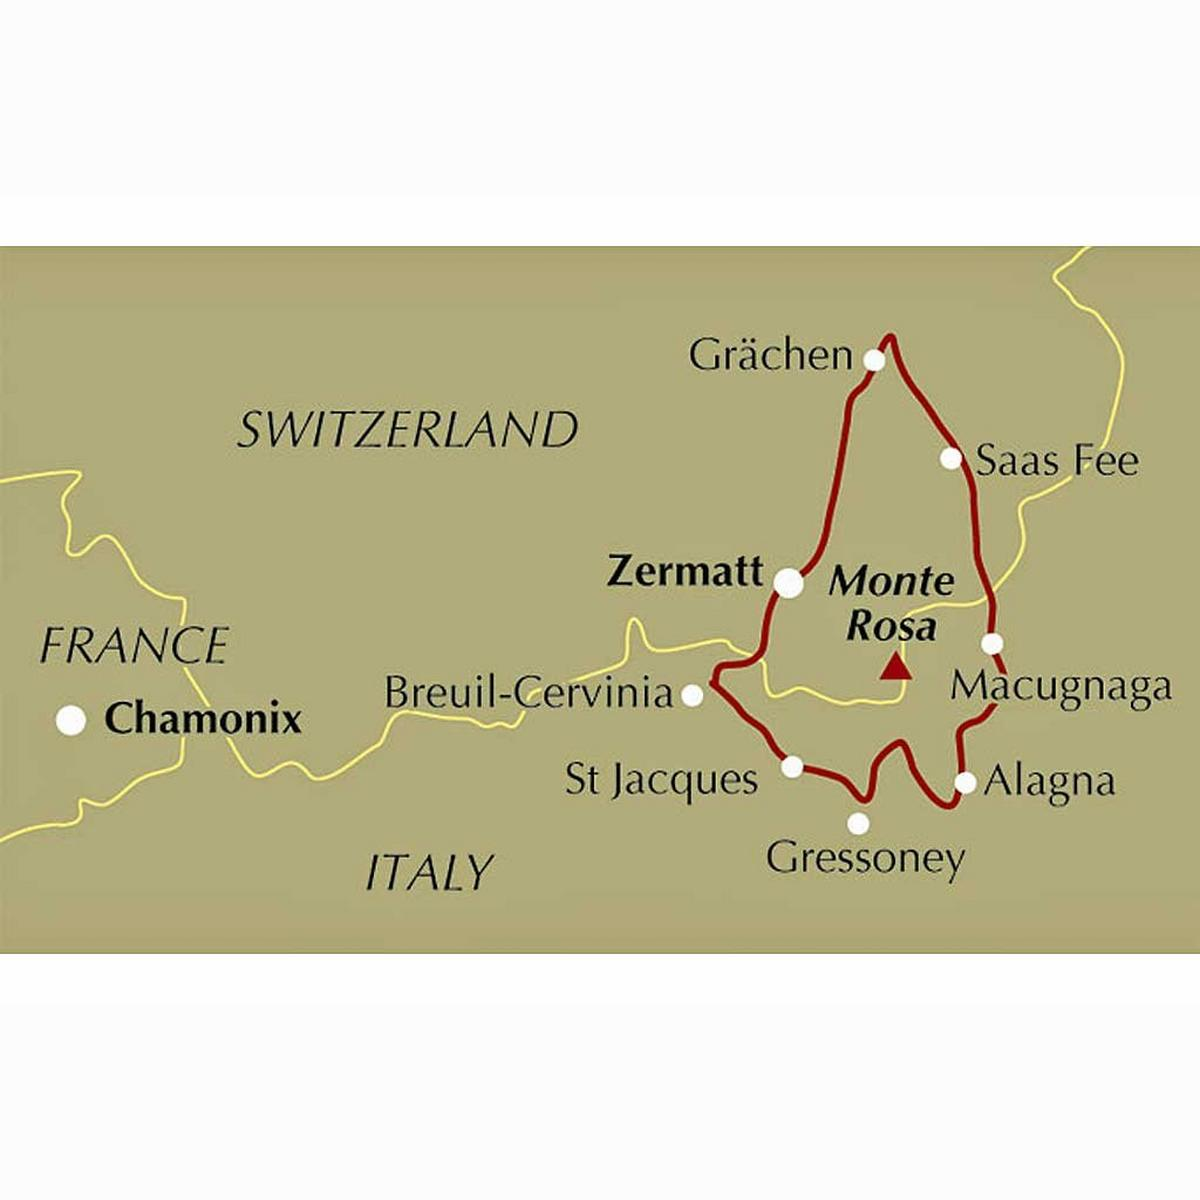 Cicerone Guide Book: The Tour of Monte Rosa